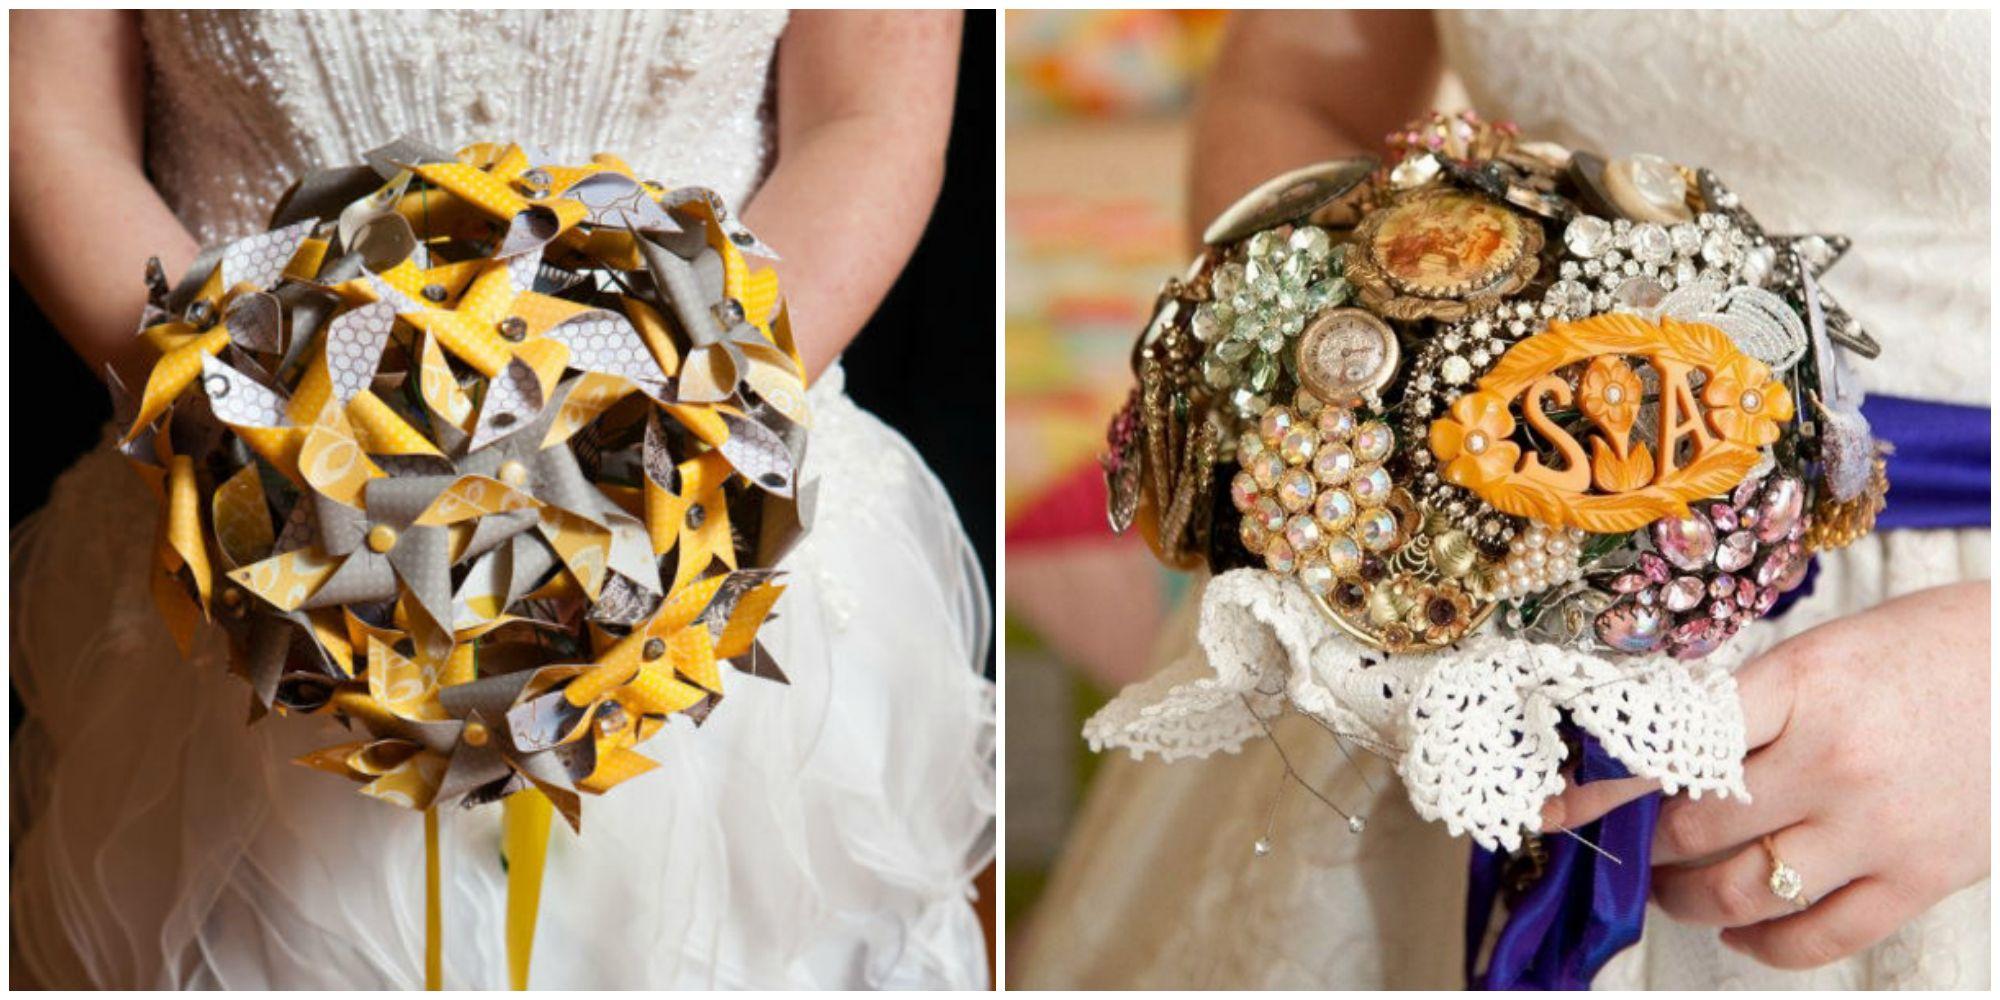 Bouquets That Aren\'t Flowers - Alternative Wedding Bouquet Ideas